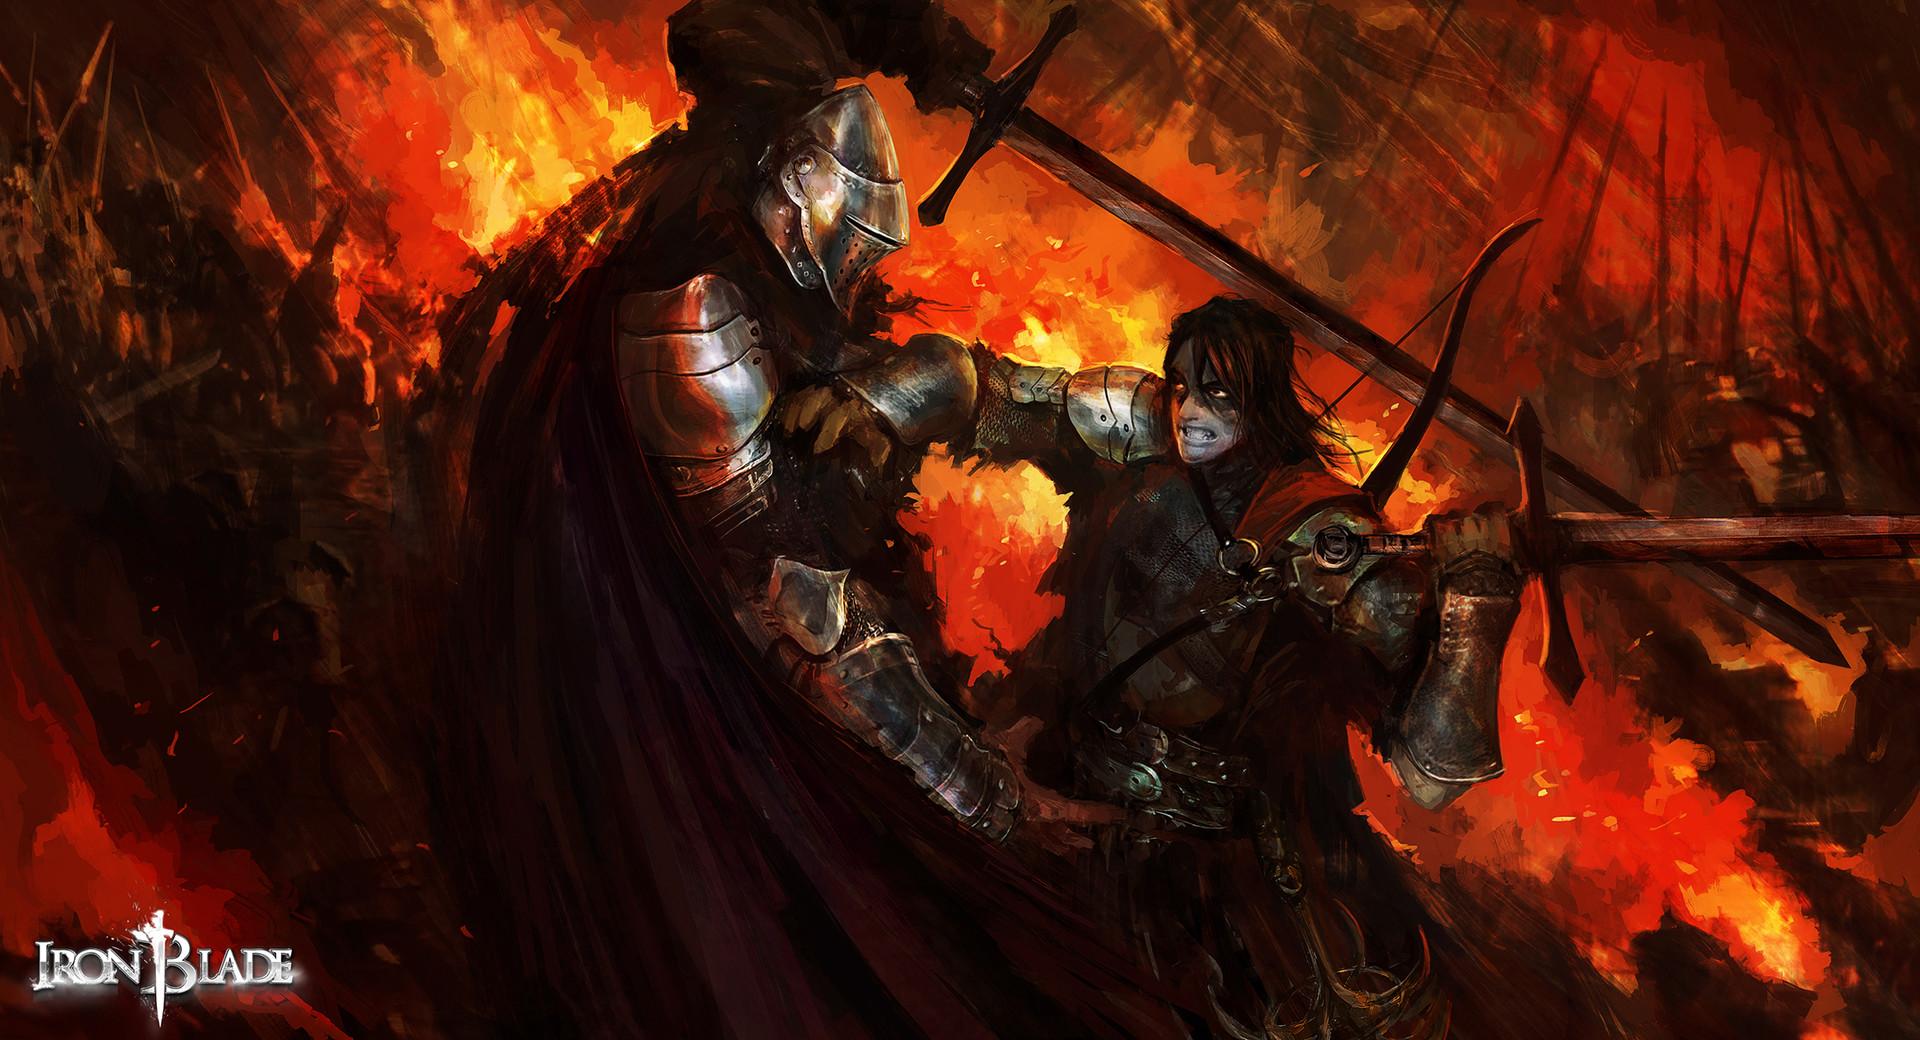 Alexandre chaudret gca characters ennemies situation 11